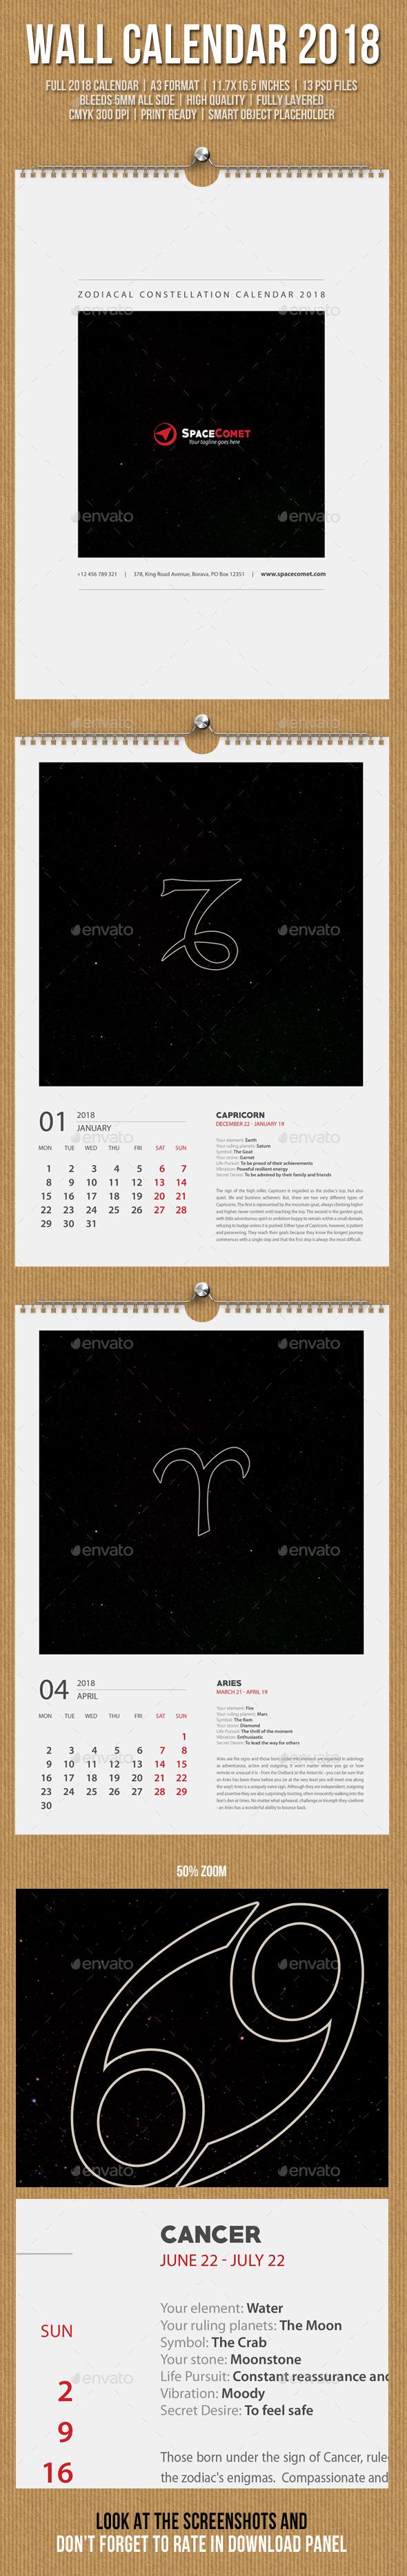 Constellation Wall Calendar A3 2018 - Calendars Stationery